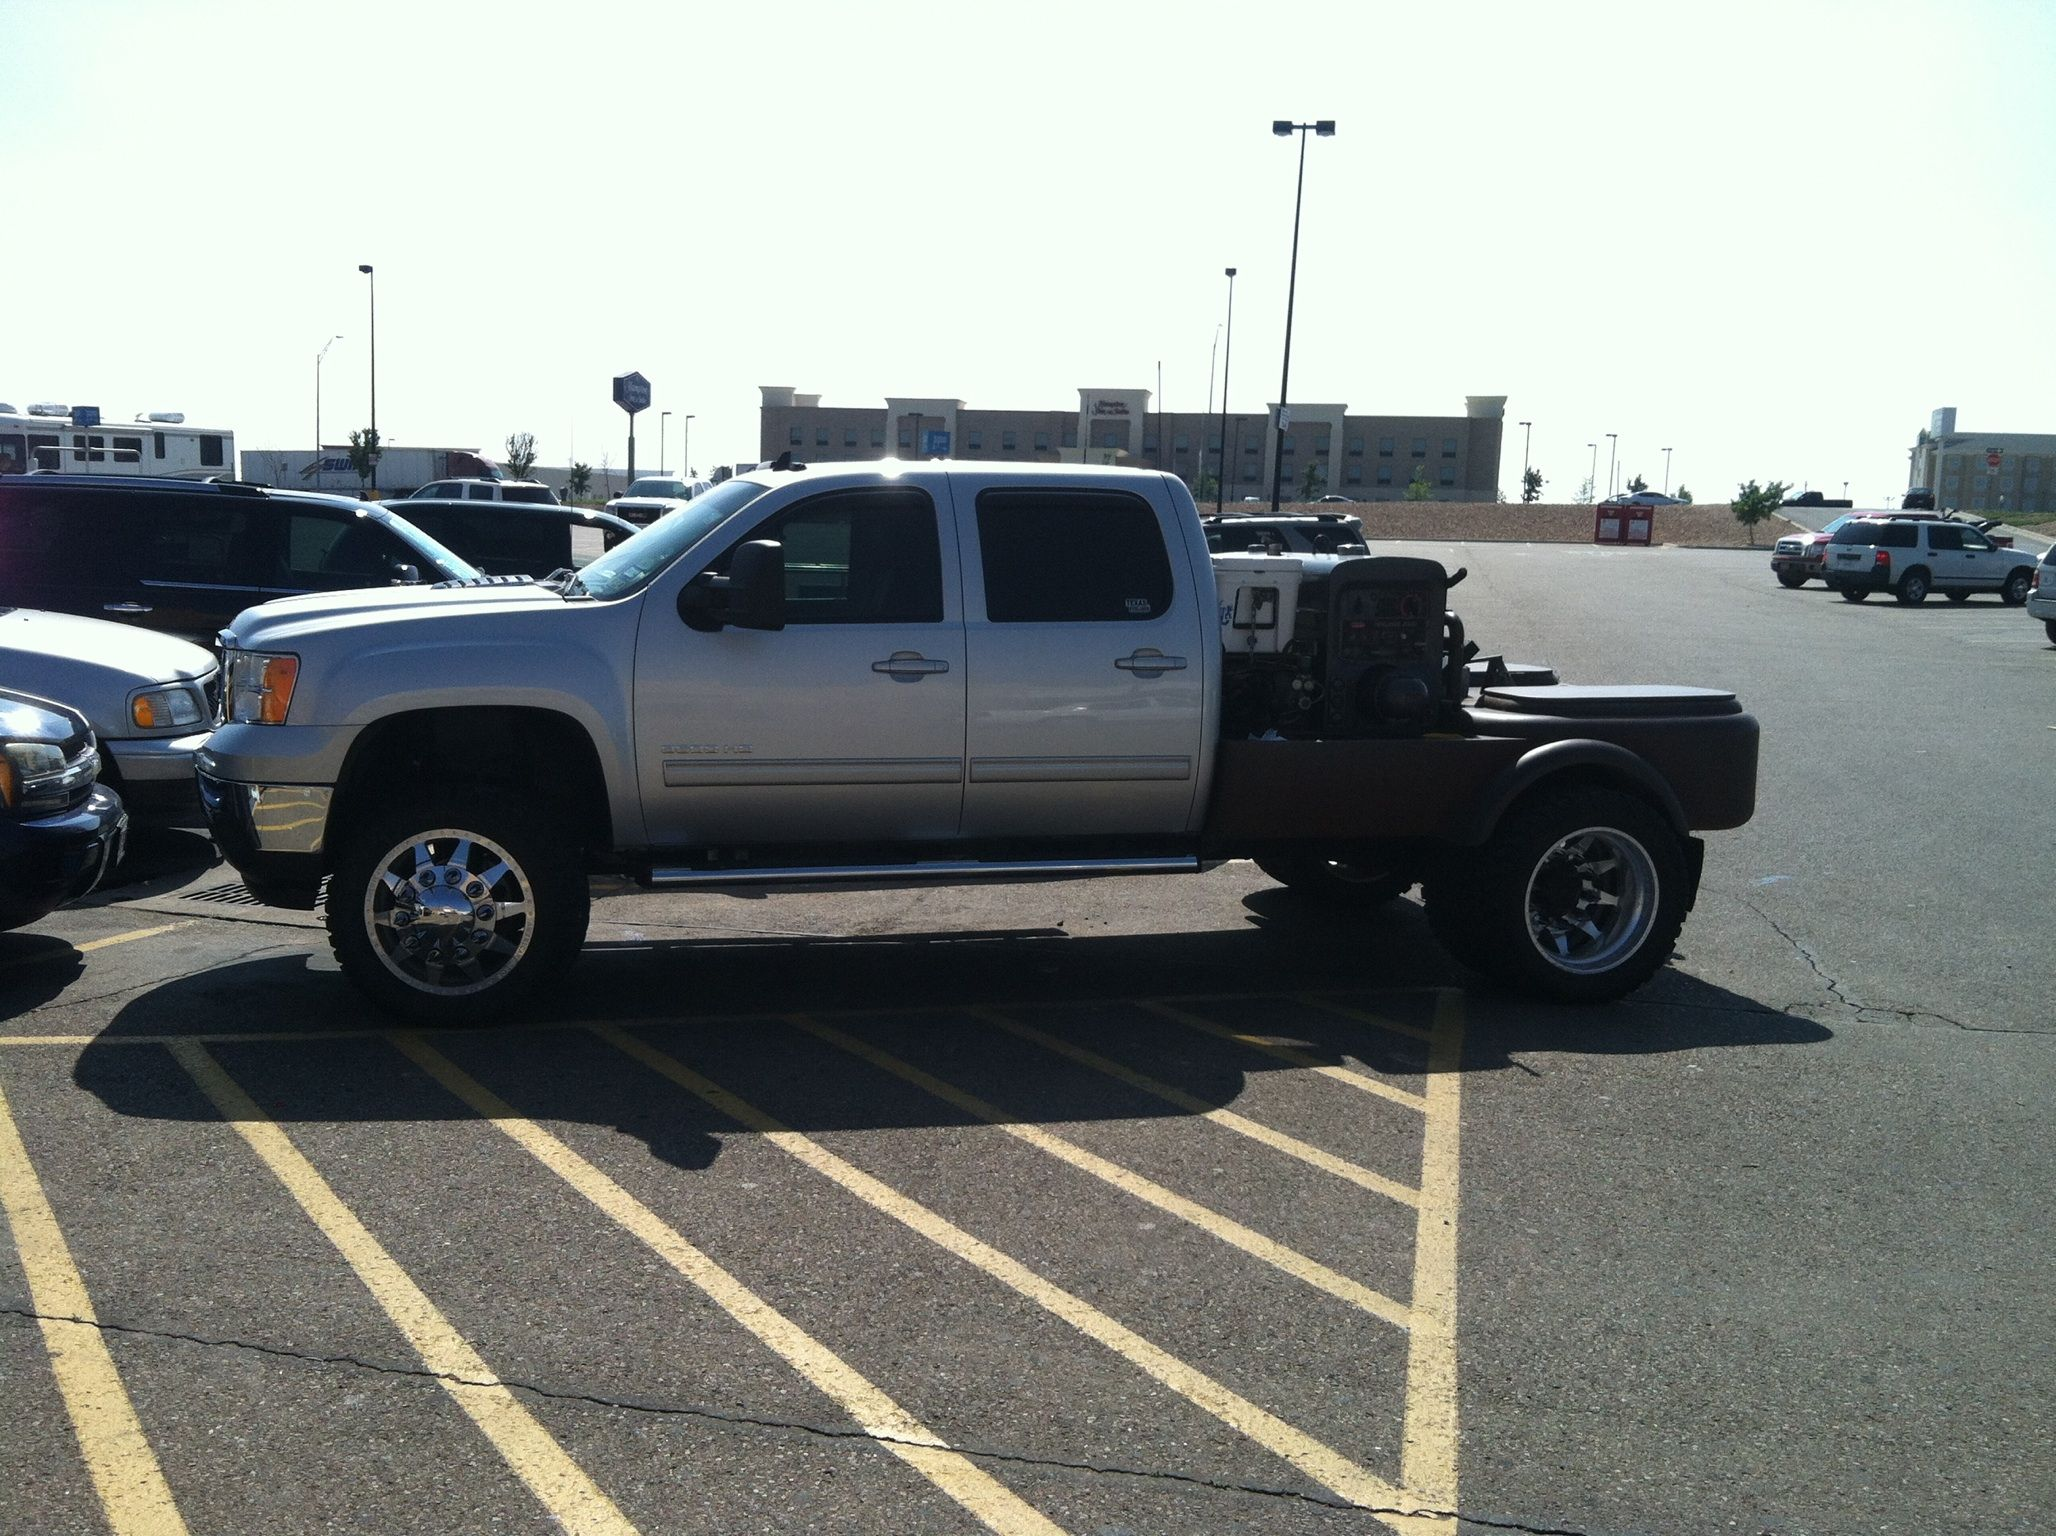 Caught in Dumas Texas Welding rig, Welding trucks